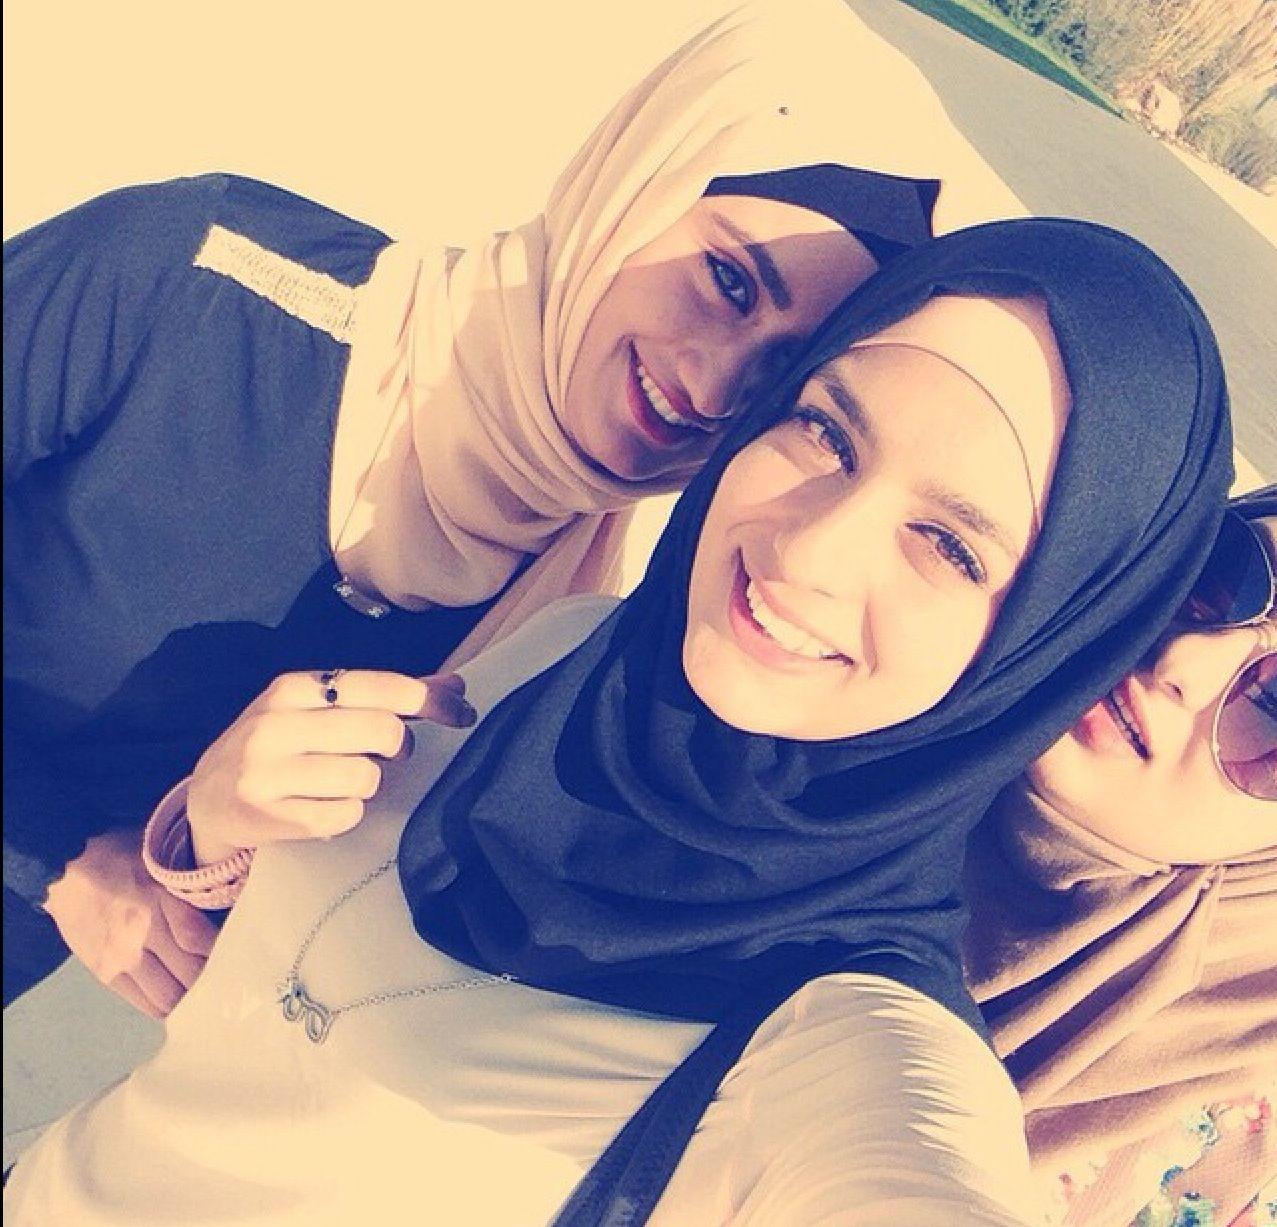 Hijab Is Love Hijabi Hijab Fashion Hijabi Girl Hijab Outfit